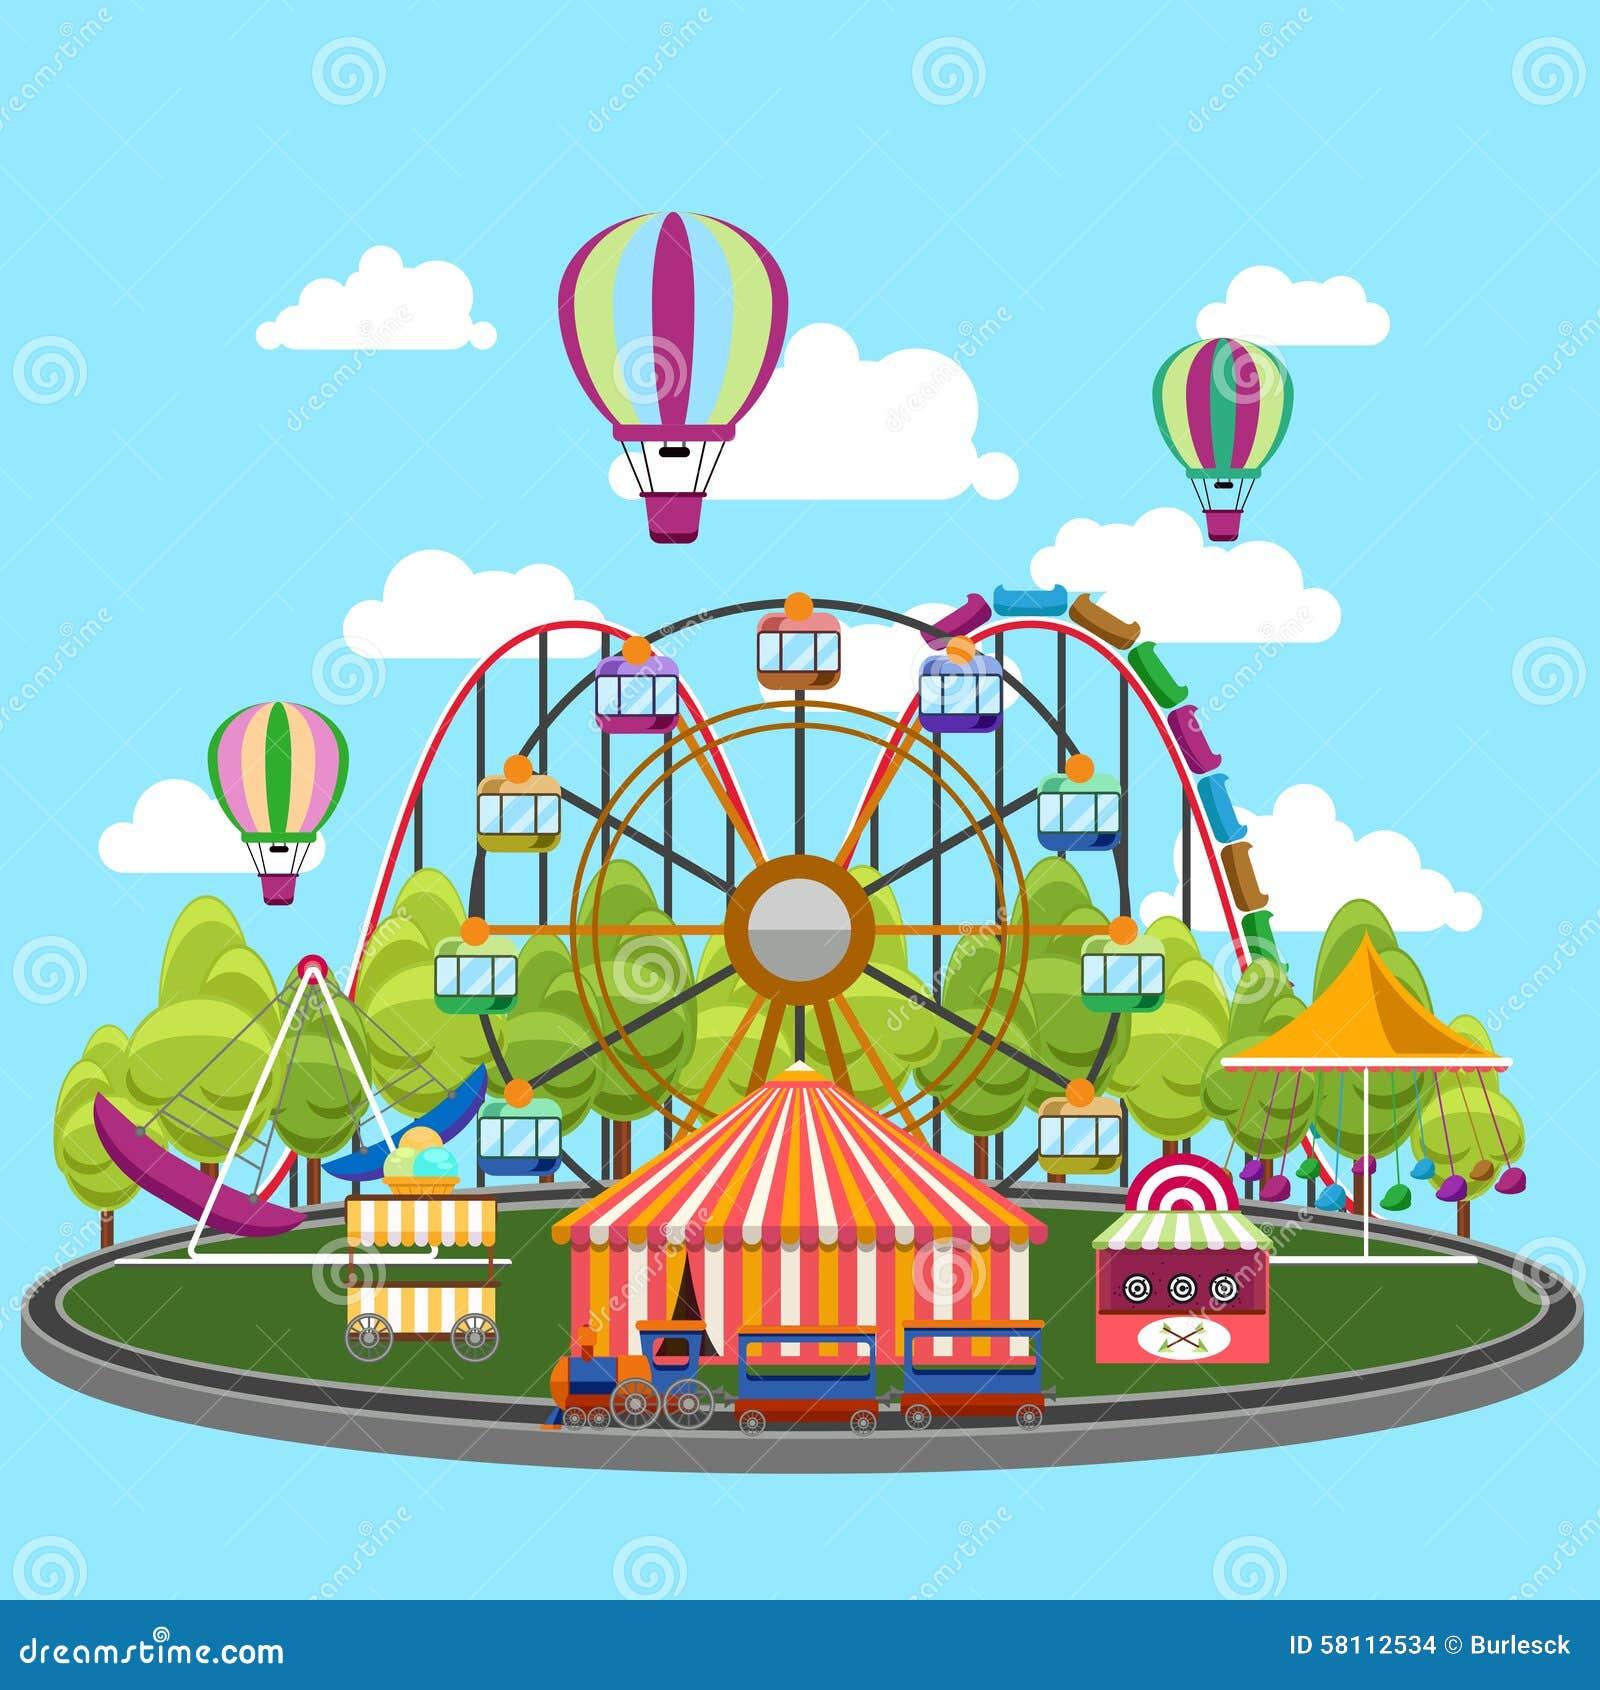 Carousel In Flat Design Stock Vector - Image: 58112534